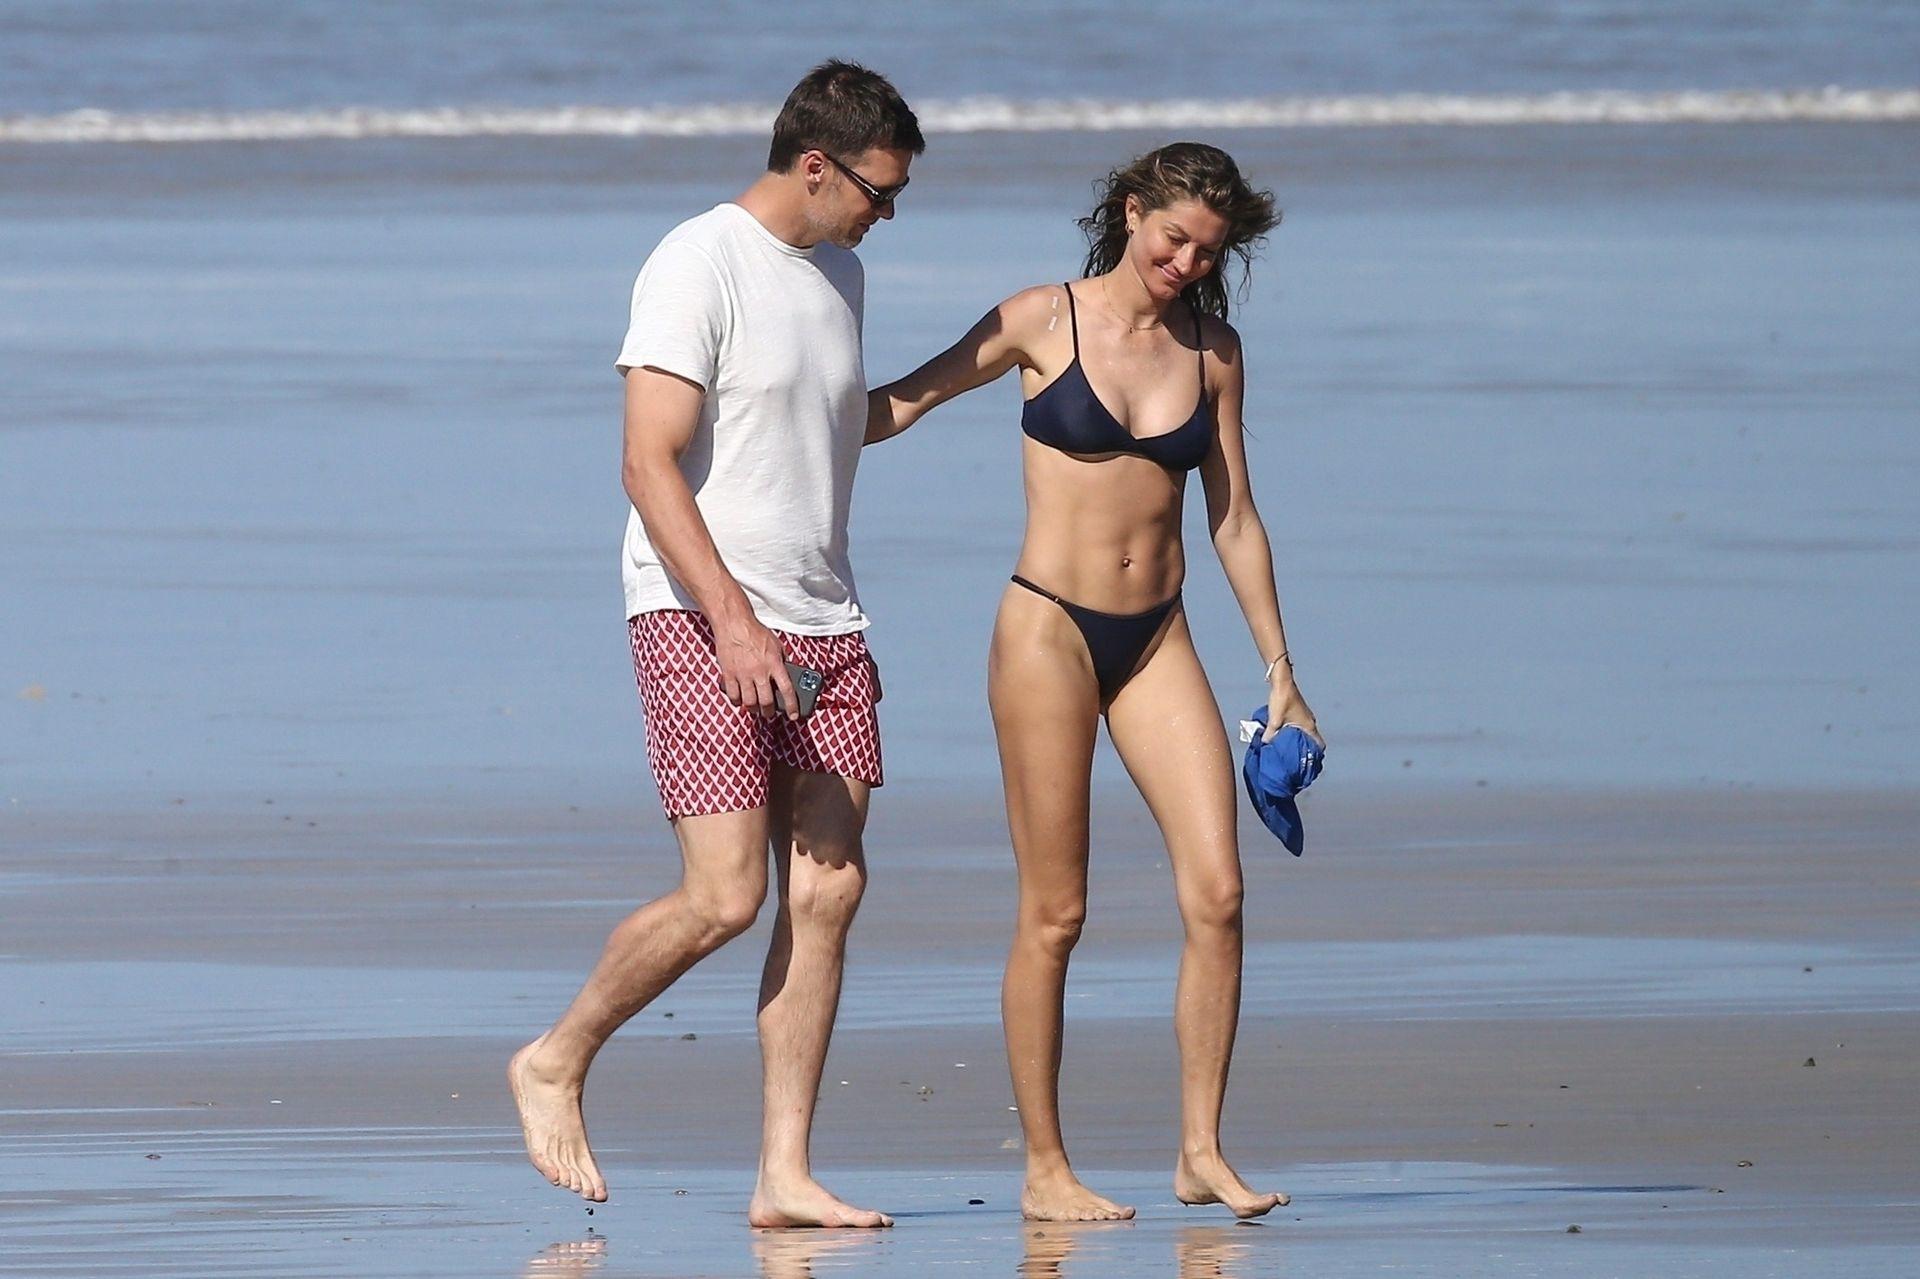 Tom Brady & Gisele Bundchen Pack On The Pda At The Beach 0015